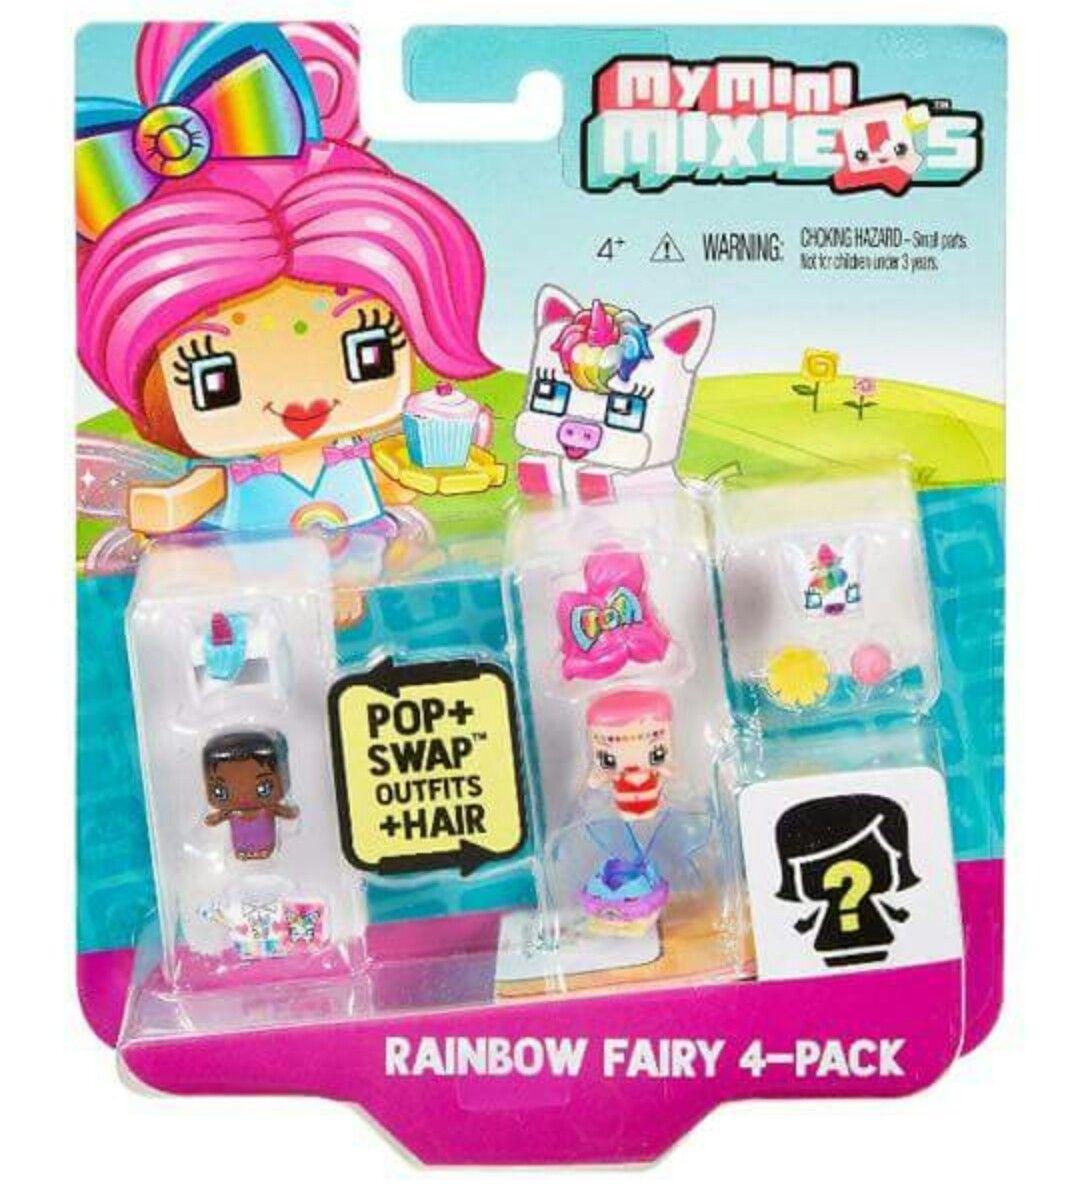 My mini mixieqs 4 pack rainbow fairy